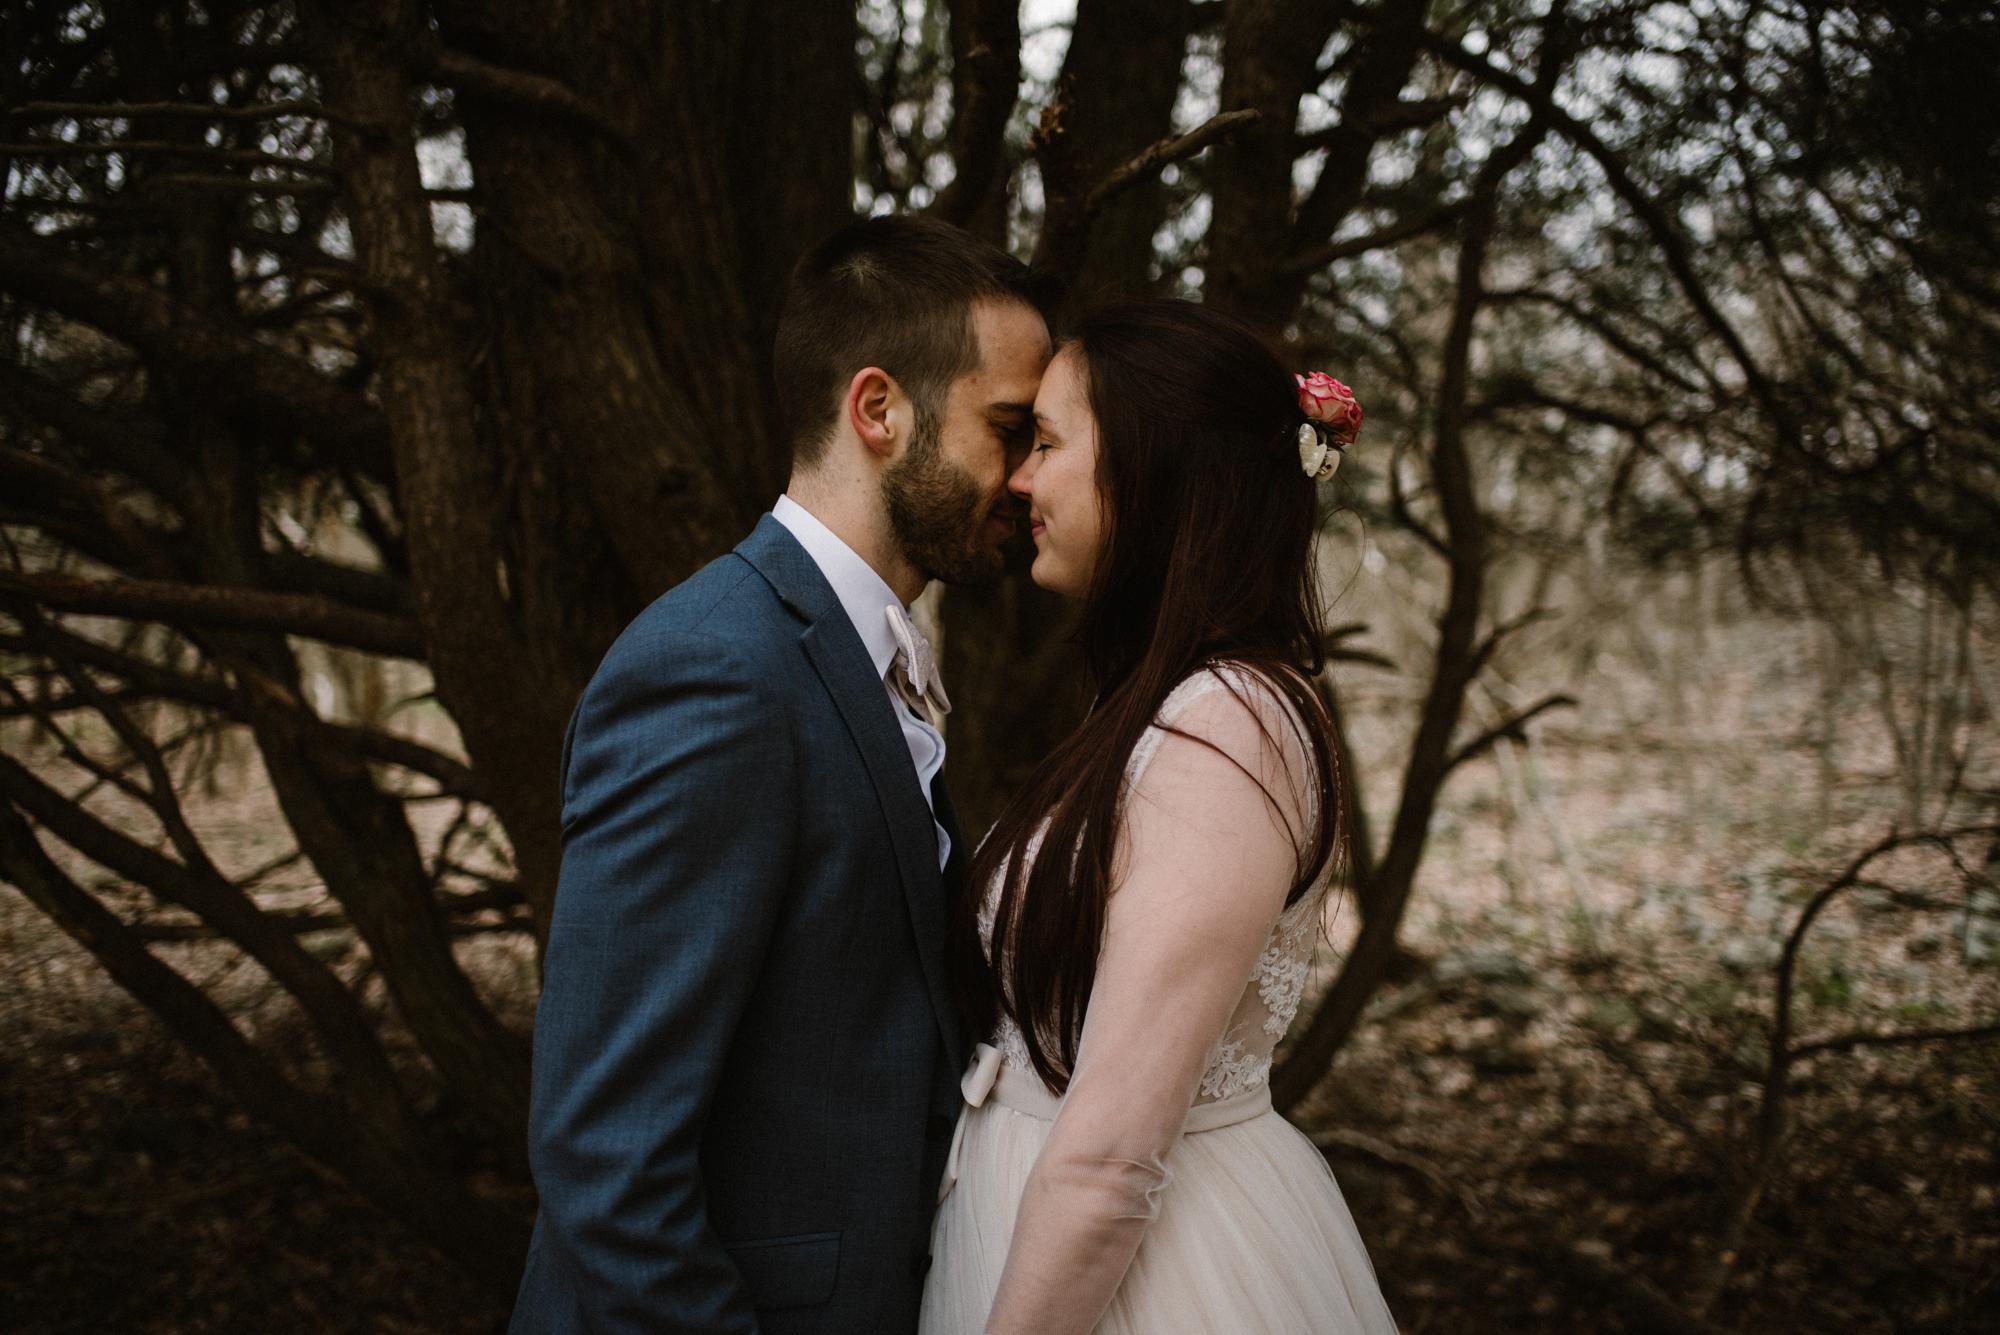 Paula and Andrew - Small Adventurous Wedding in Shenandoah National Park - Blue Ridge Mountain Wedding - White Sails Creative - Mountain Elopement_43.jpg